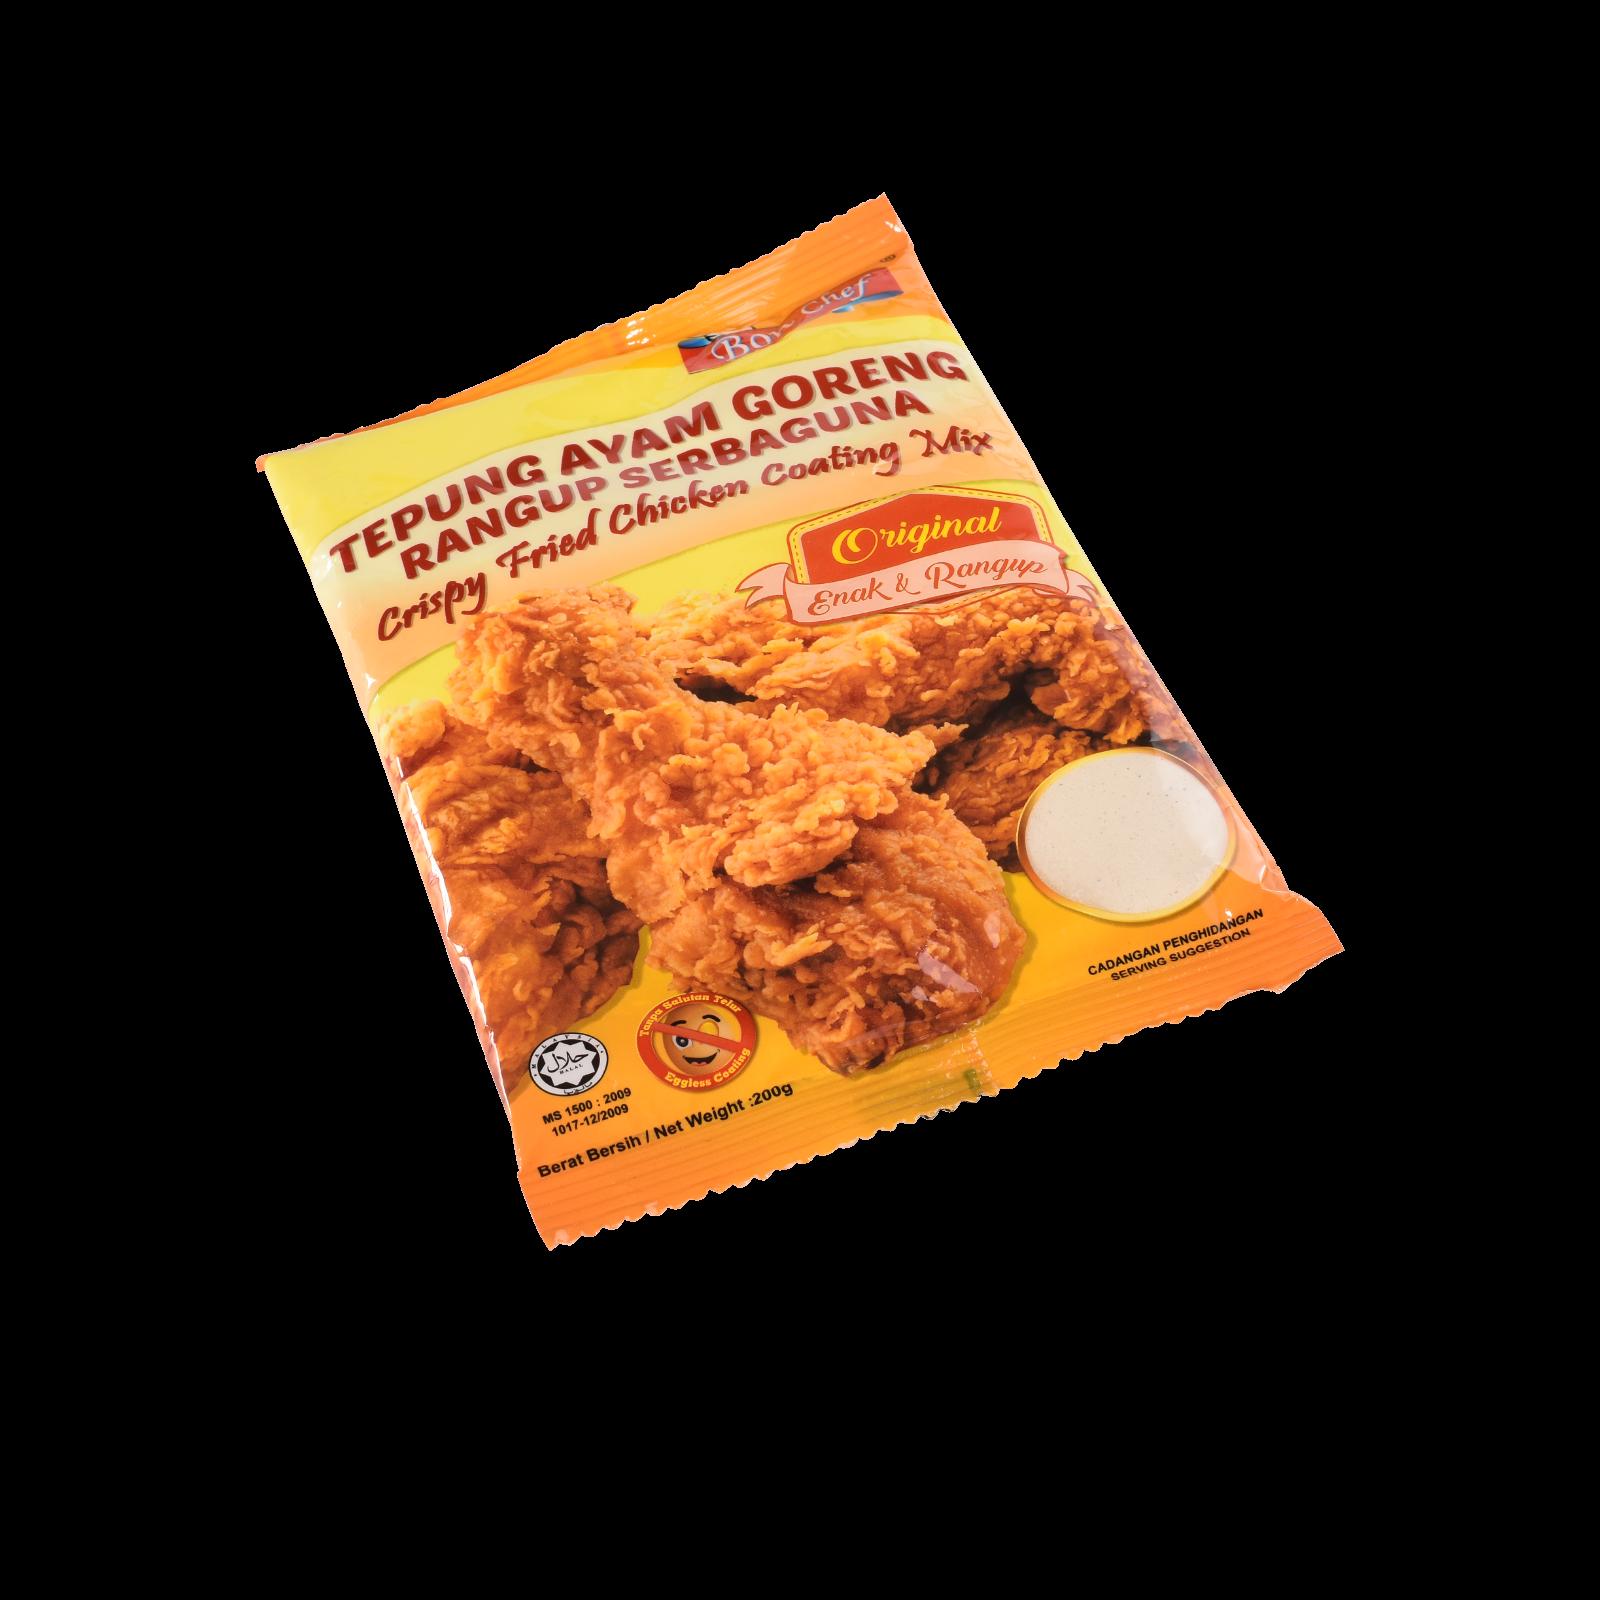 bon chef crispy fried chicken coating mix.png